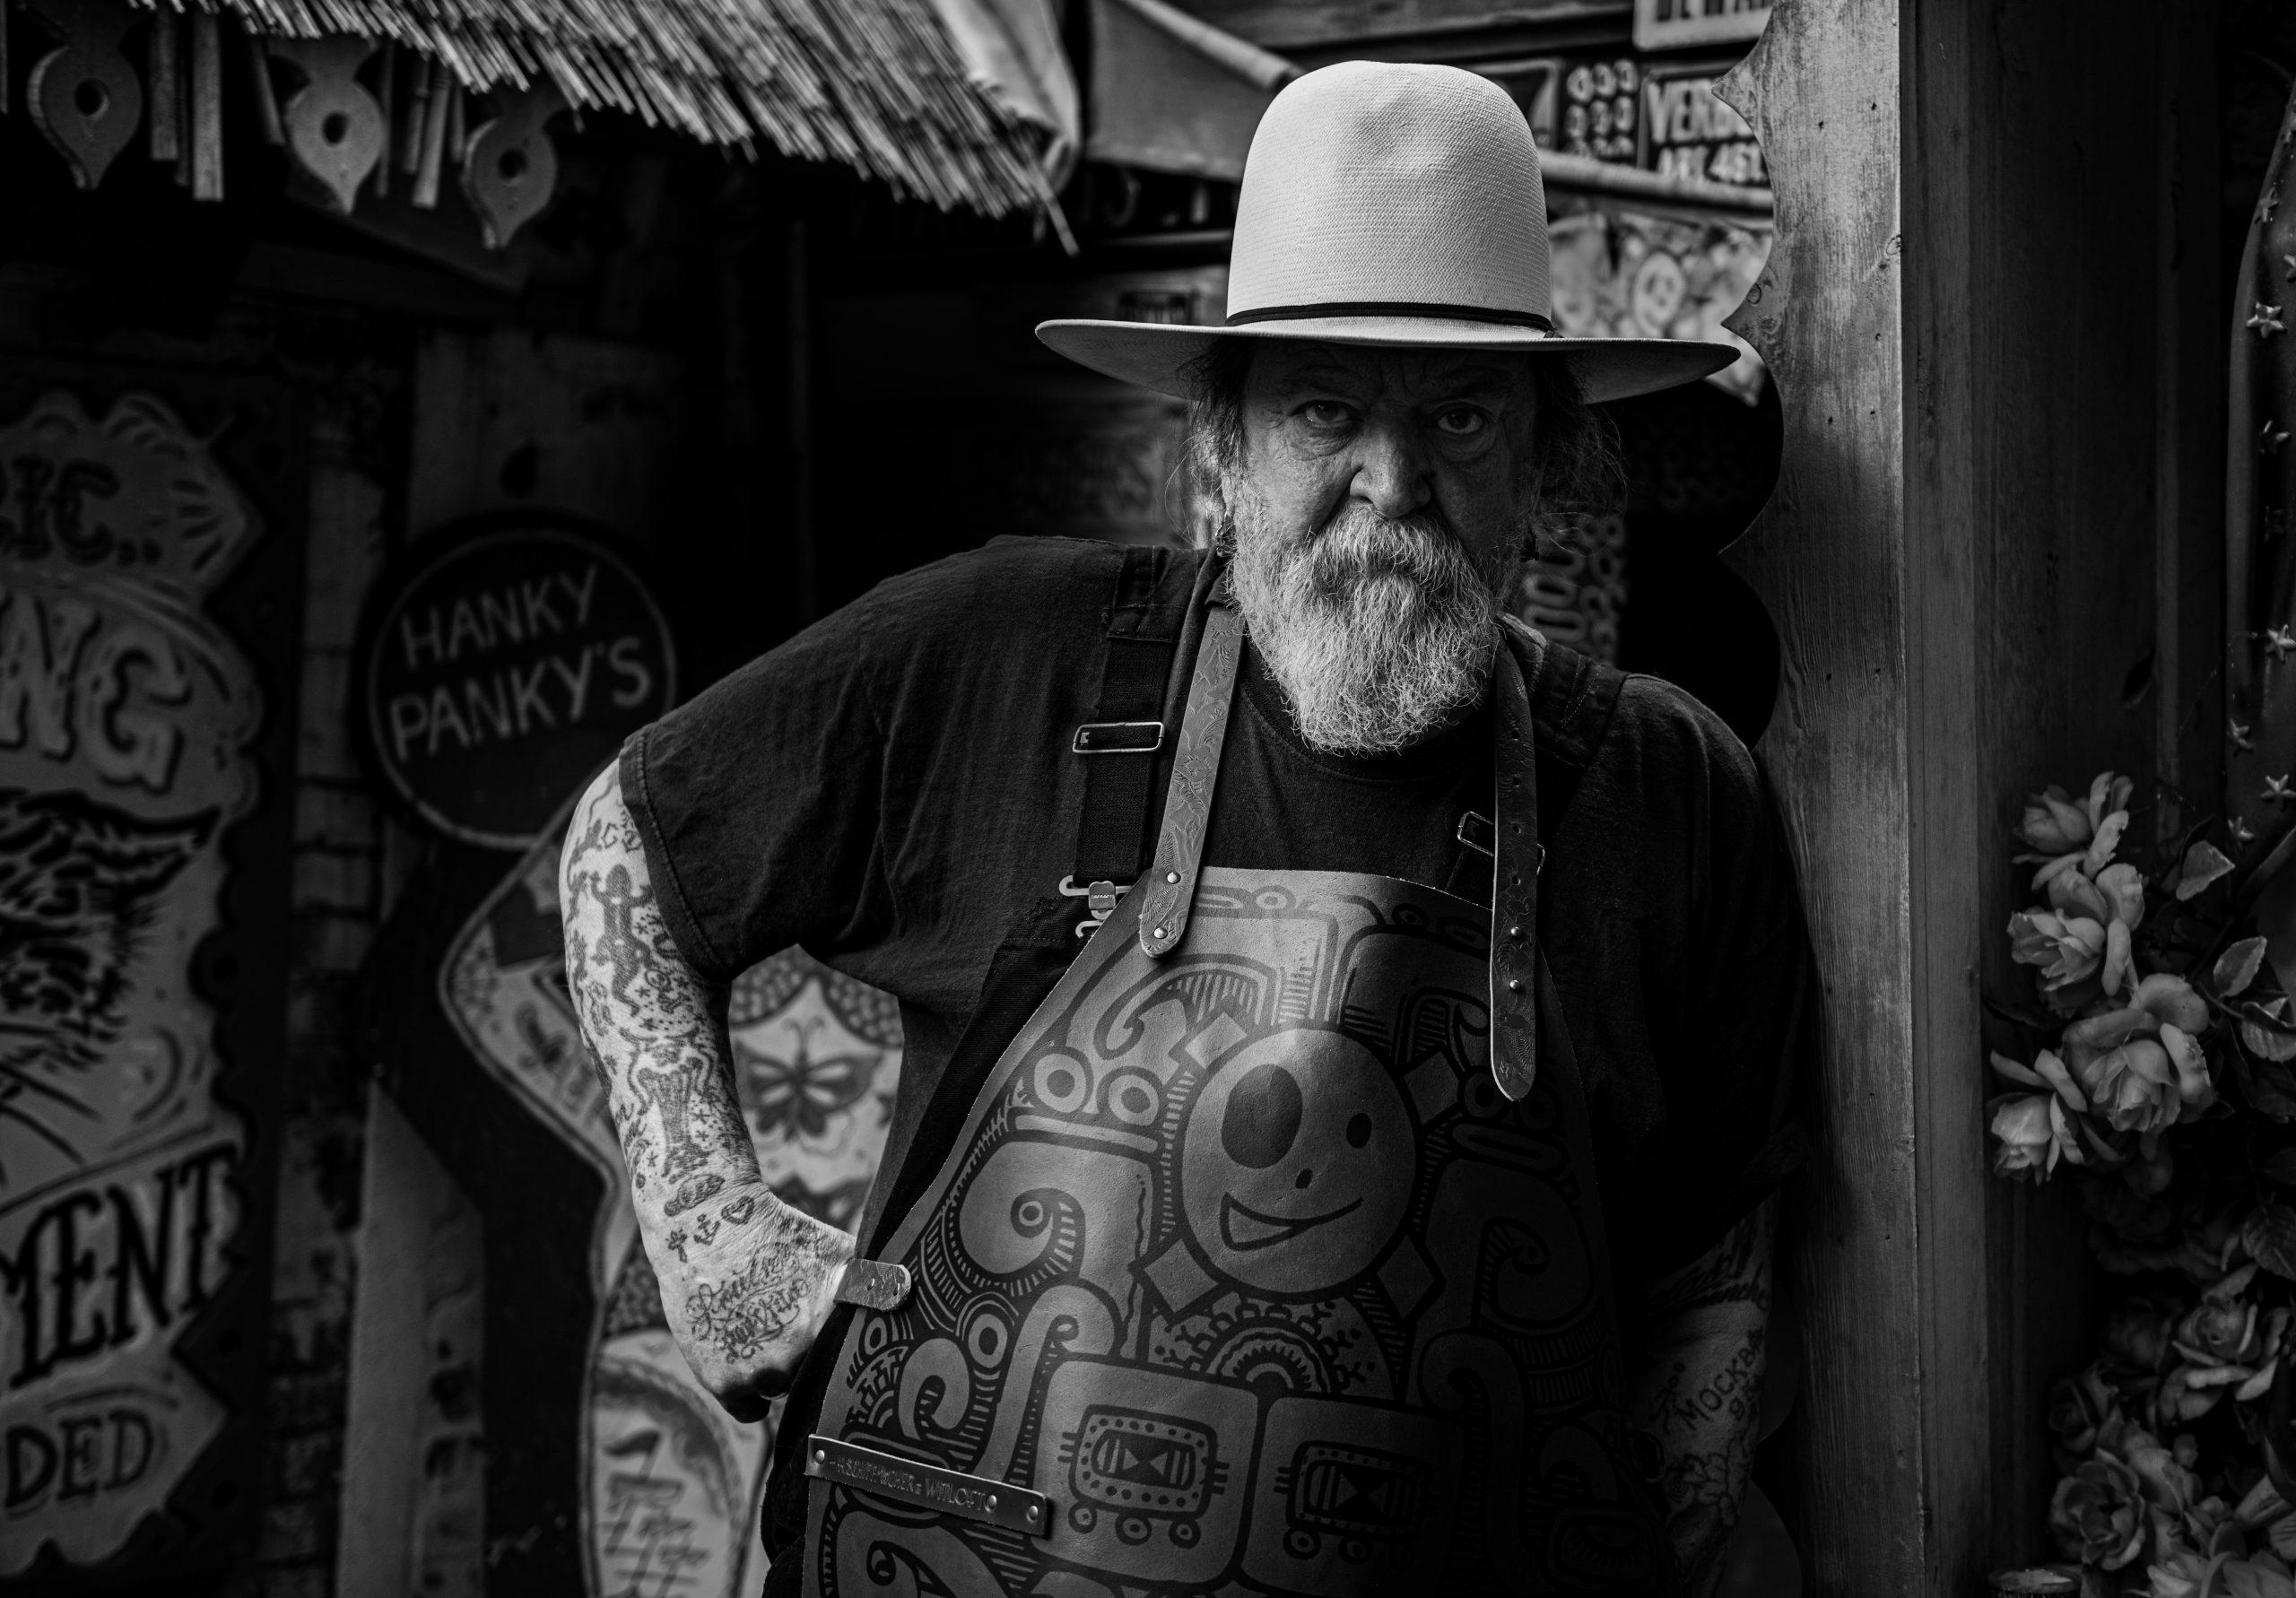 schiffmacher tattooed apron